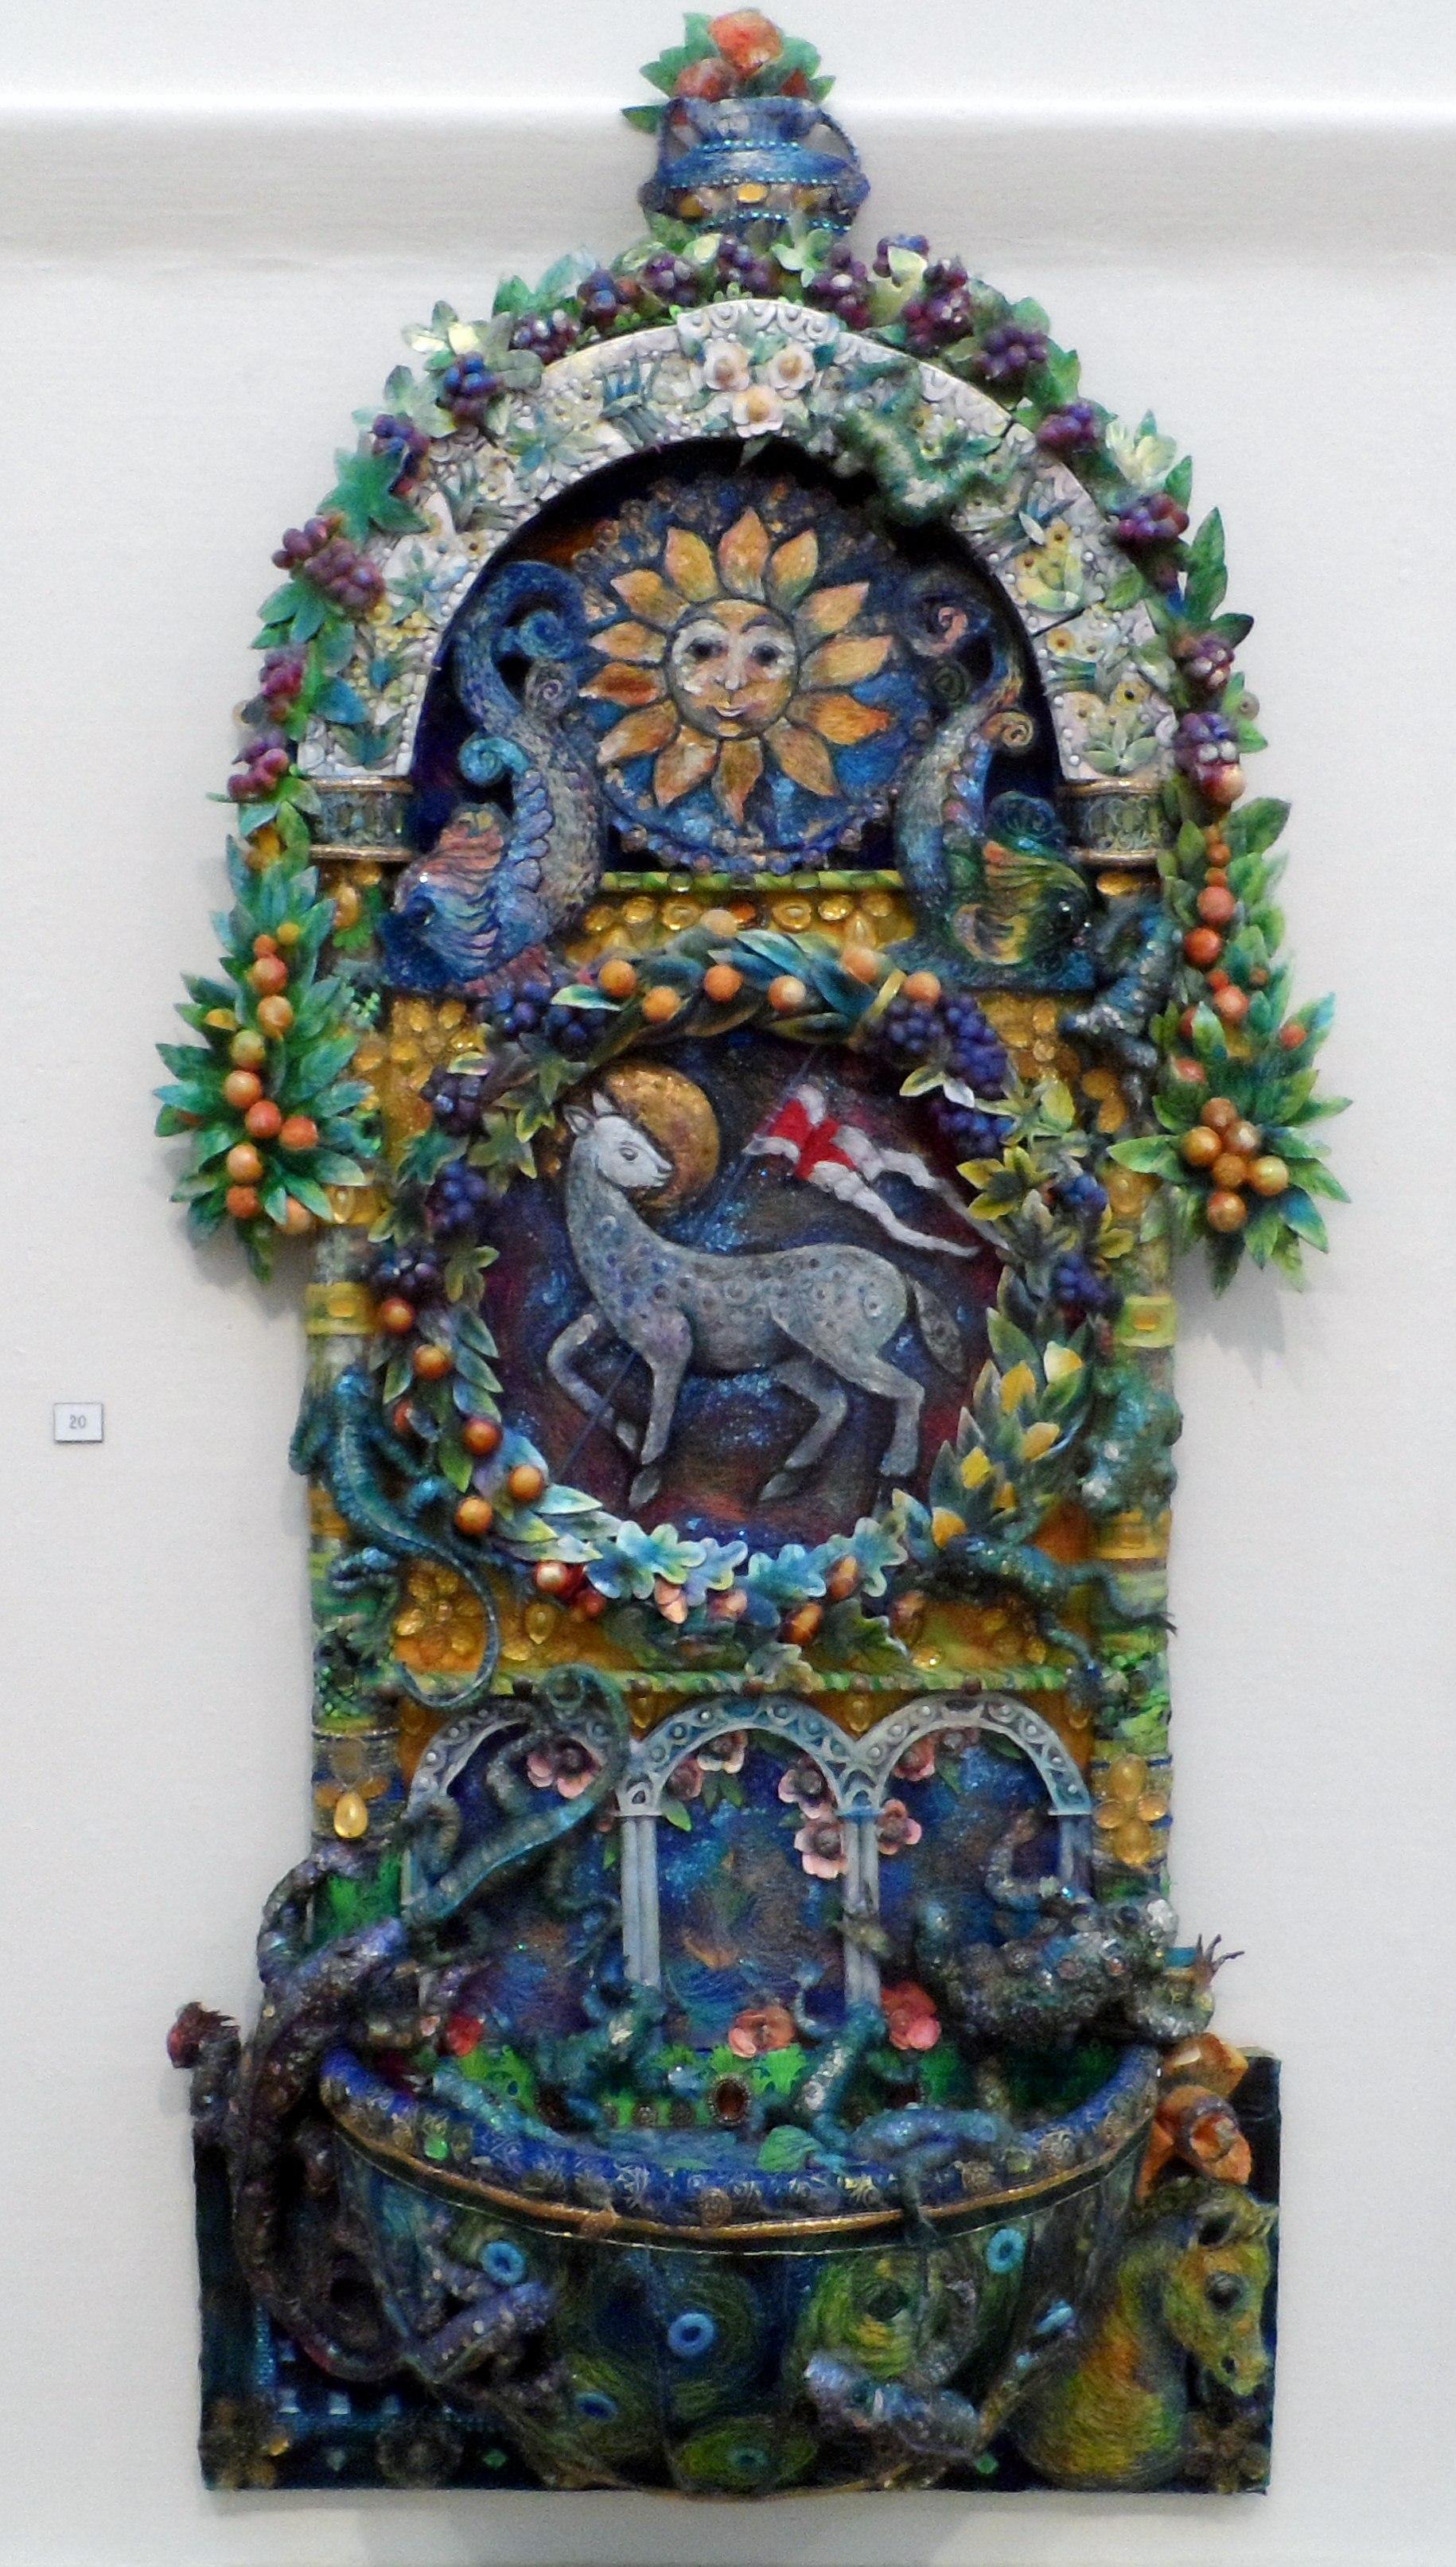 LA FONTANA by Nikki Parmenter, Williamson Gallery, 2019